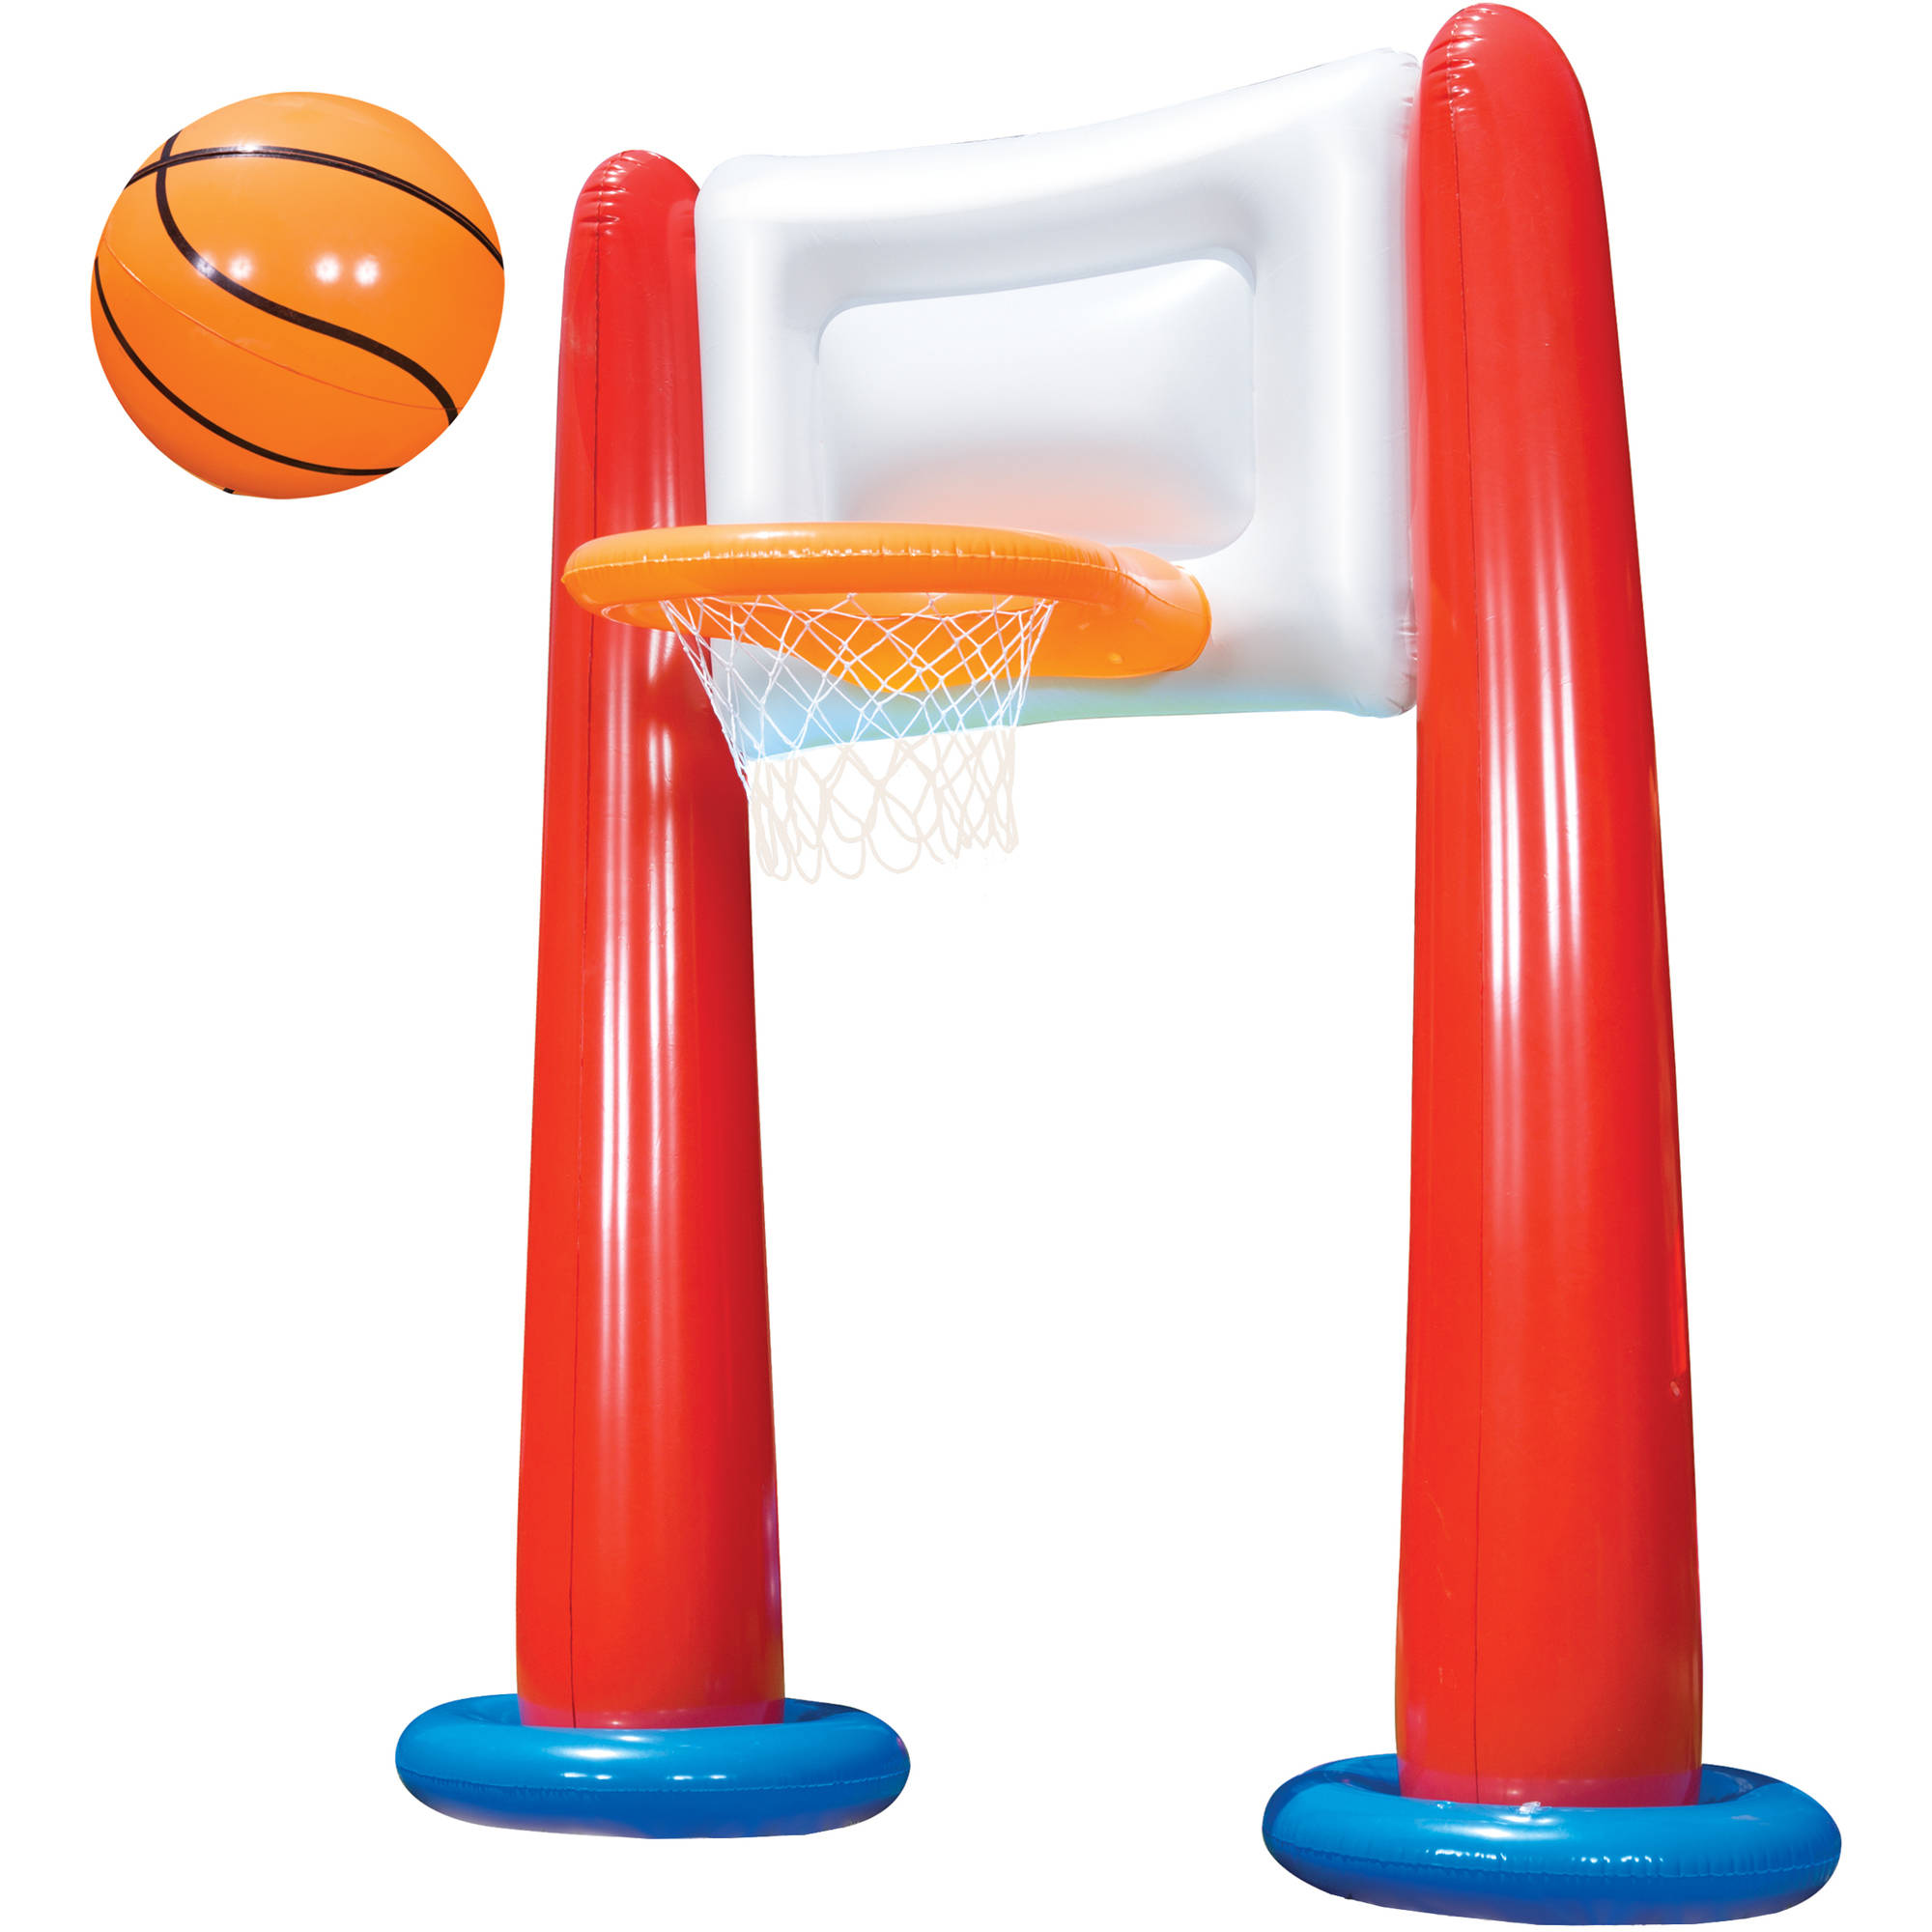 Banzai Mega All-Star Basketball Set with Inflatable Backboard and Ball by Banzai